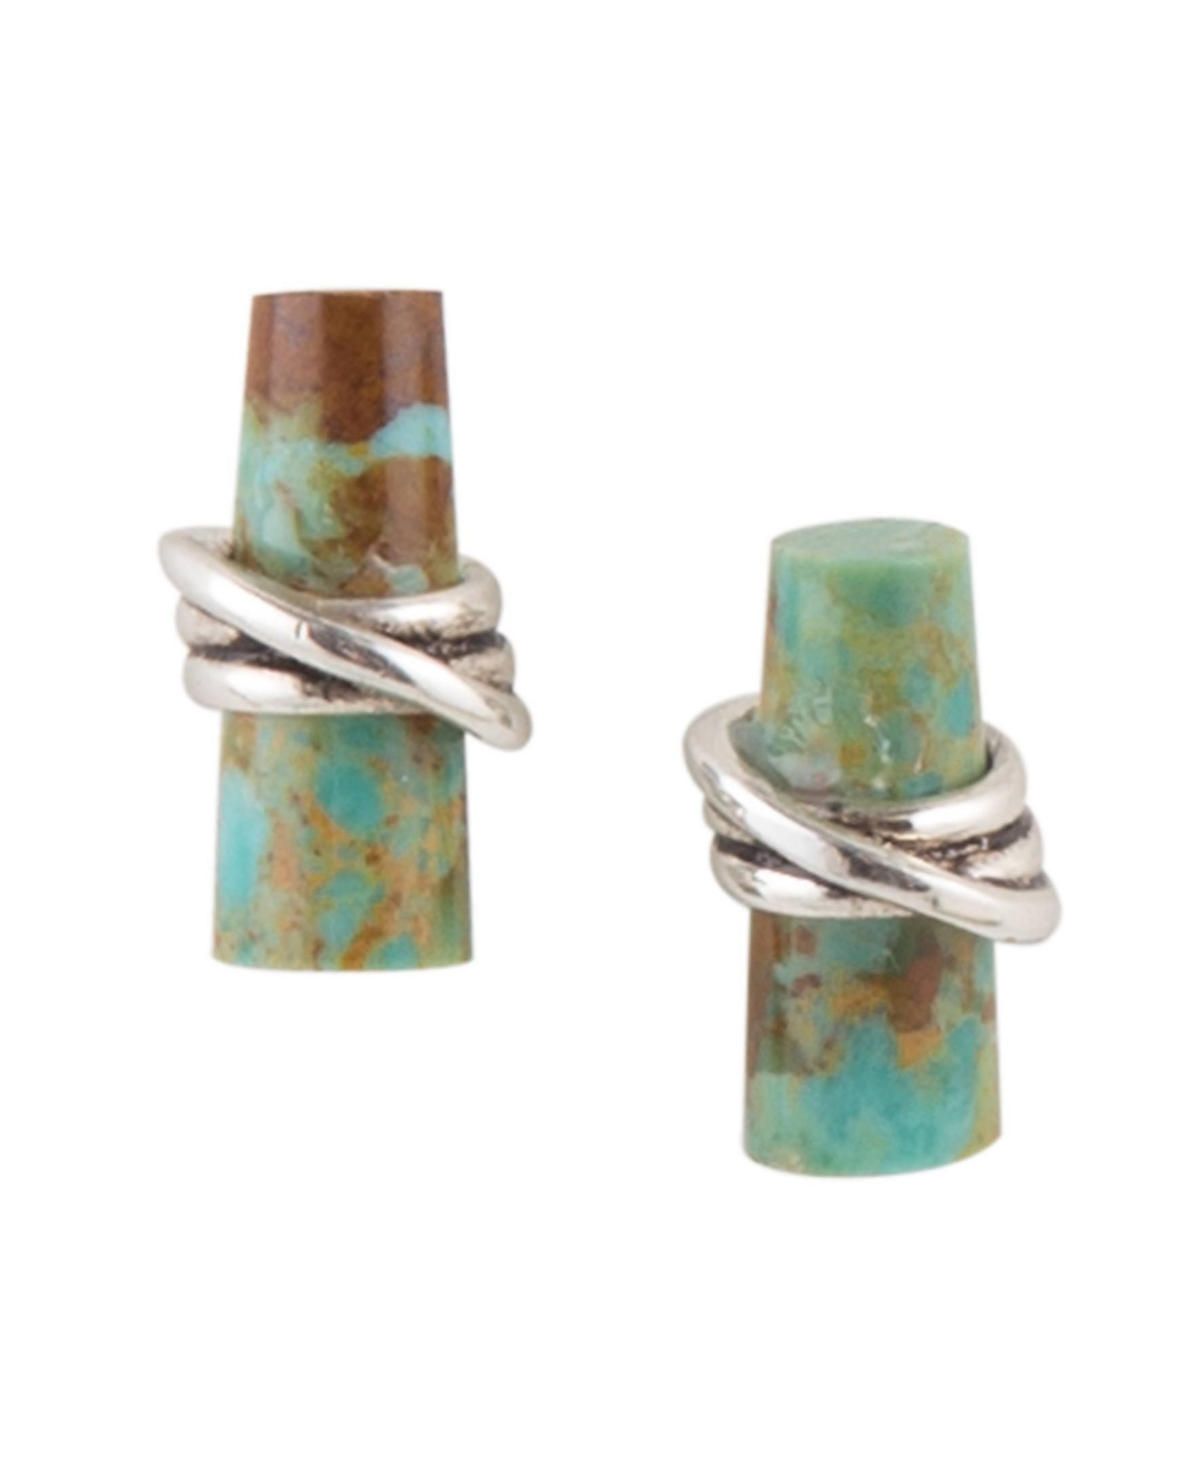 Barse Criss Cross Stud Earrings